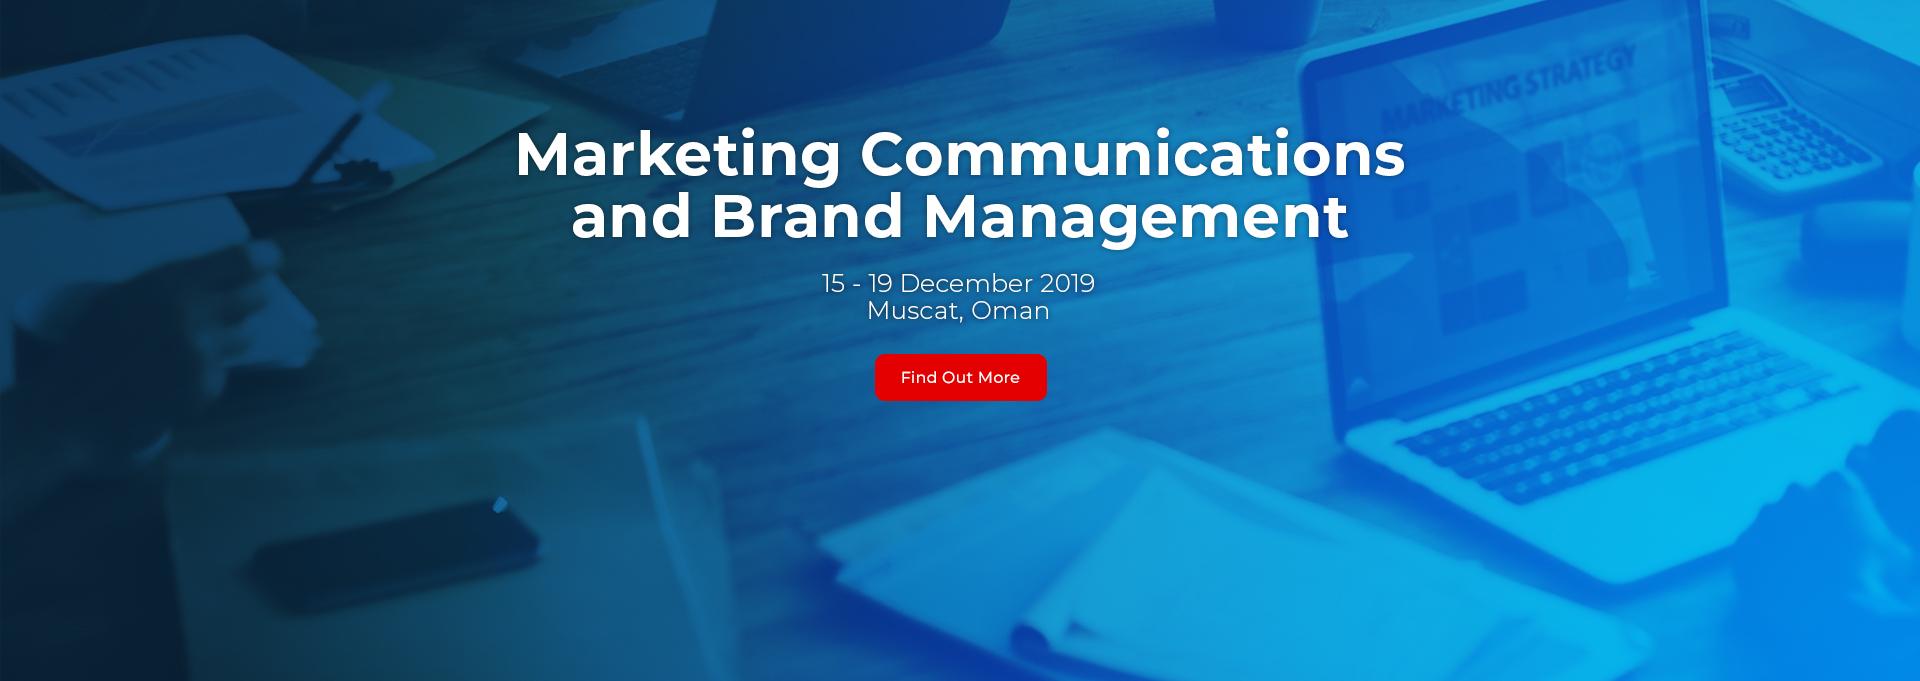 EuroMaTech Marketing Communications and Brand Management